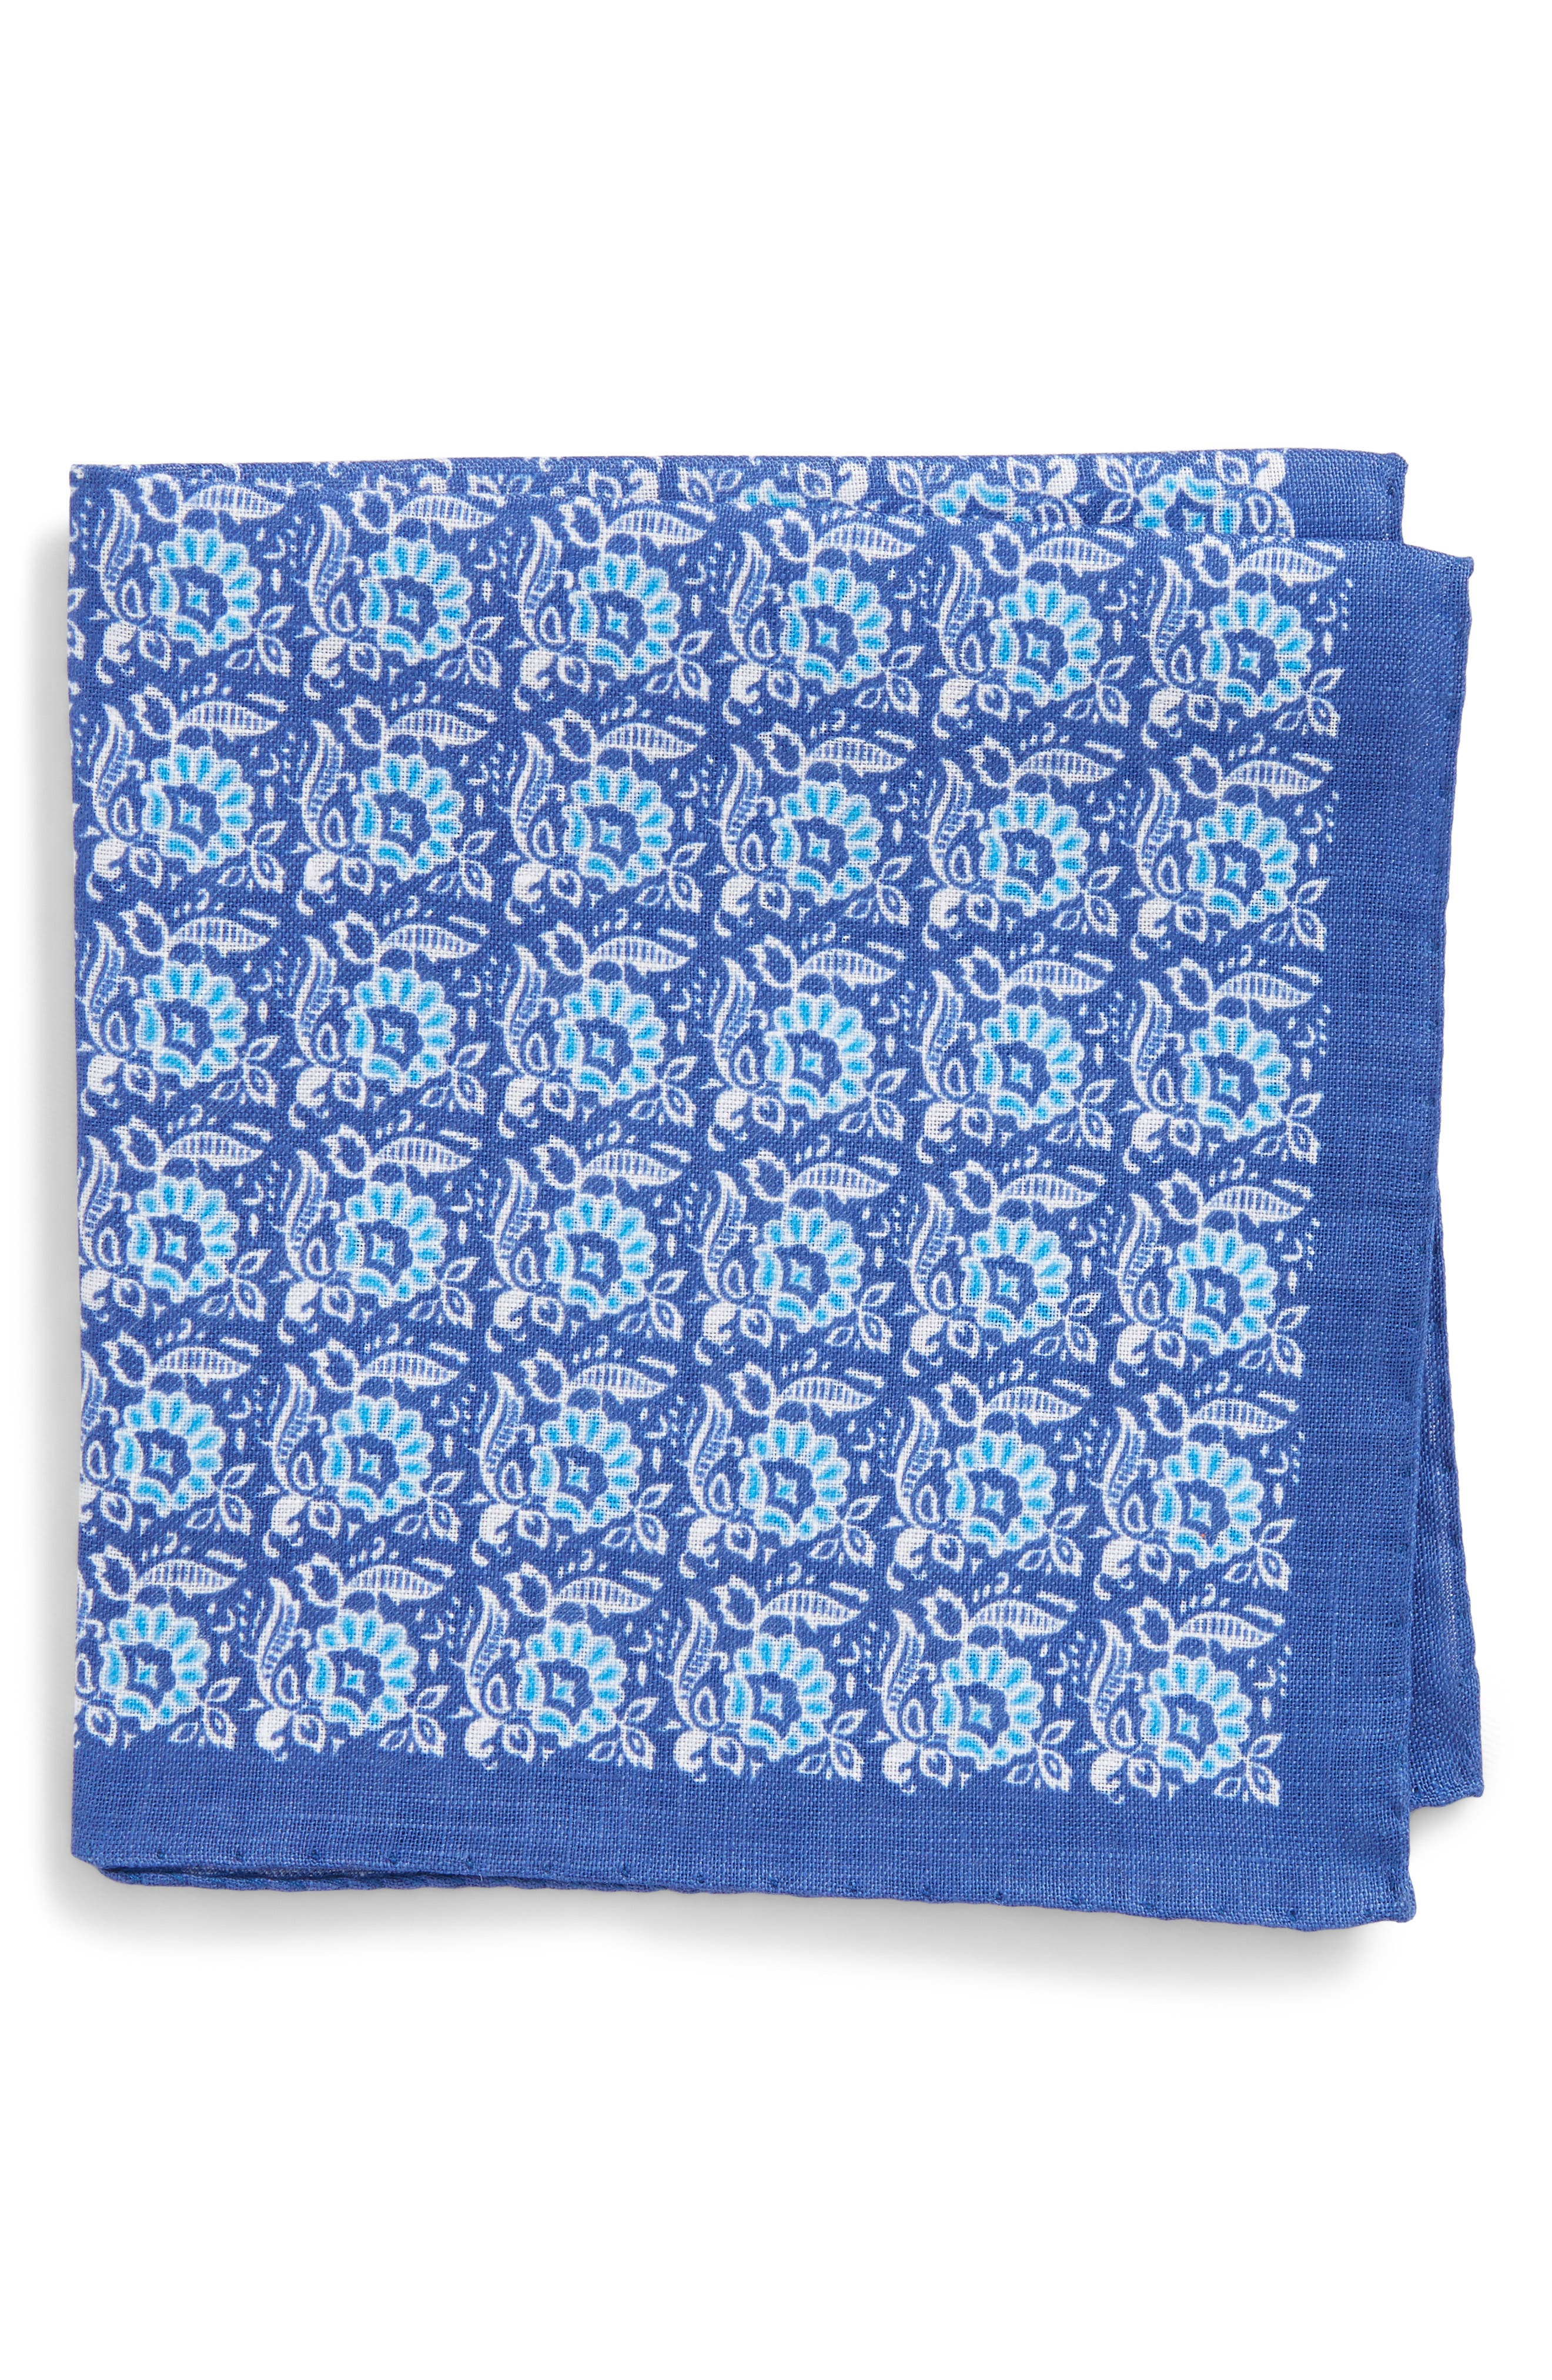 Strong Suit Linen Pocket Square